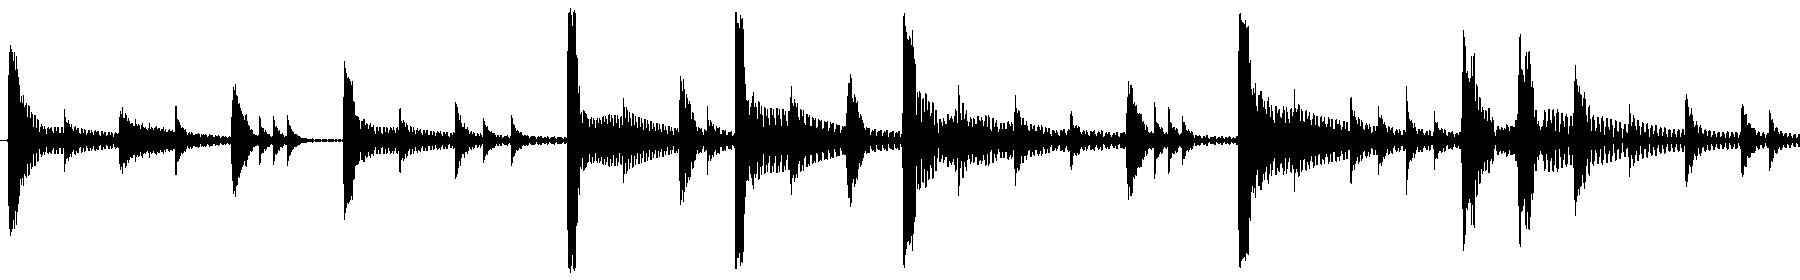 newonebeat